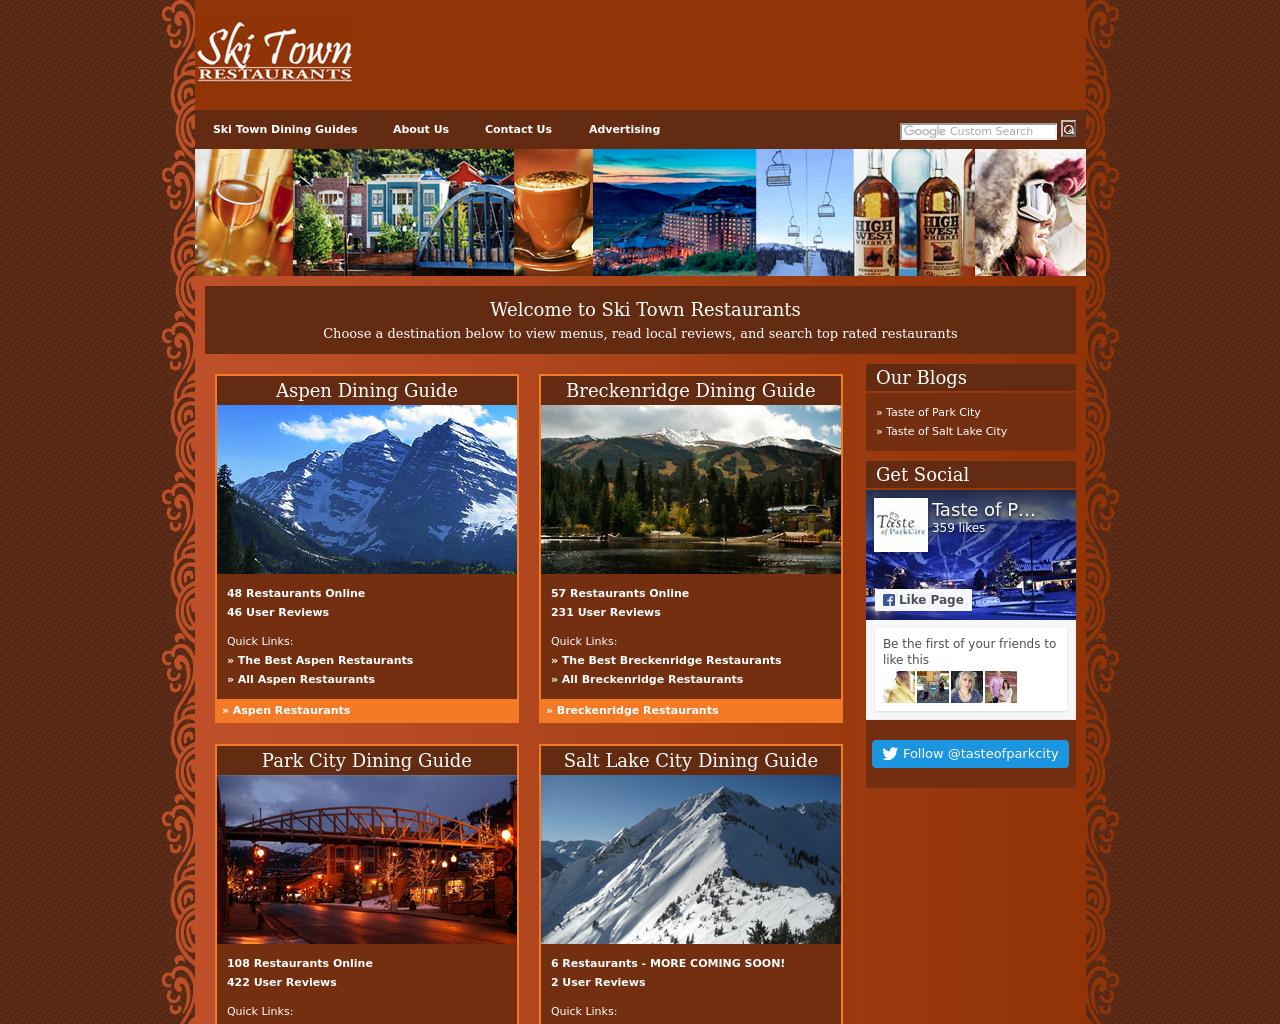 Ski-Town-Restaurants-Advertising-Reviews-Pricing